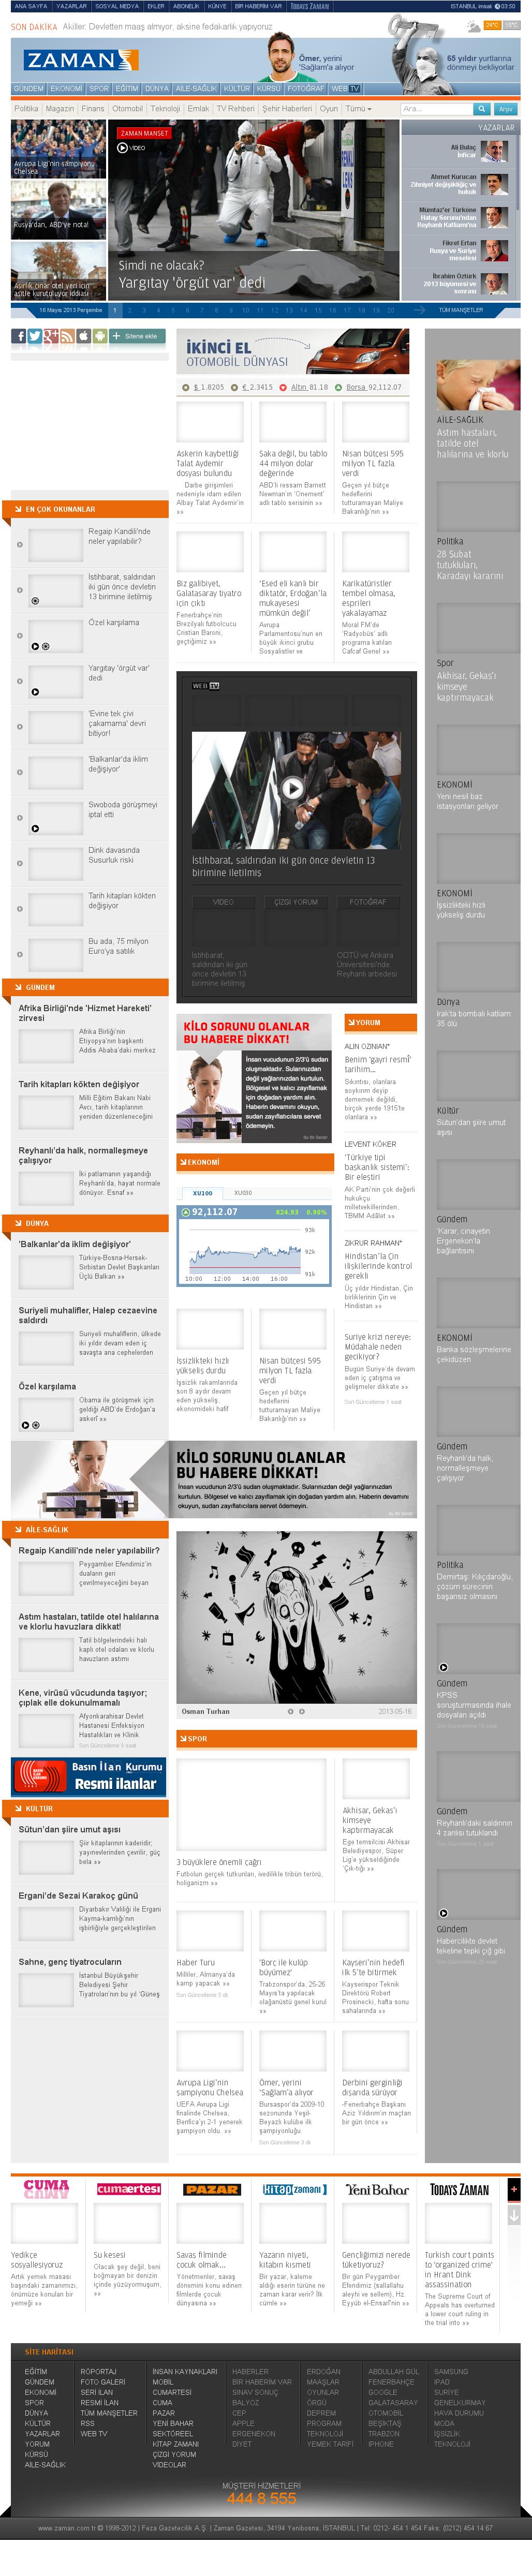 Zaman Online at Thursday May 16, 2013, 12:32 a.m. UTC